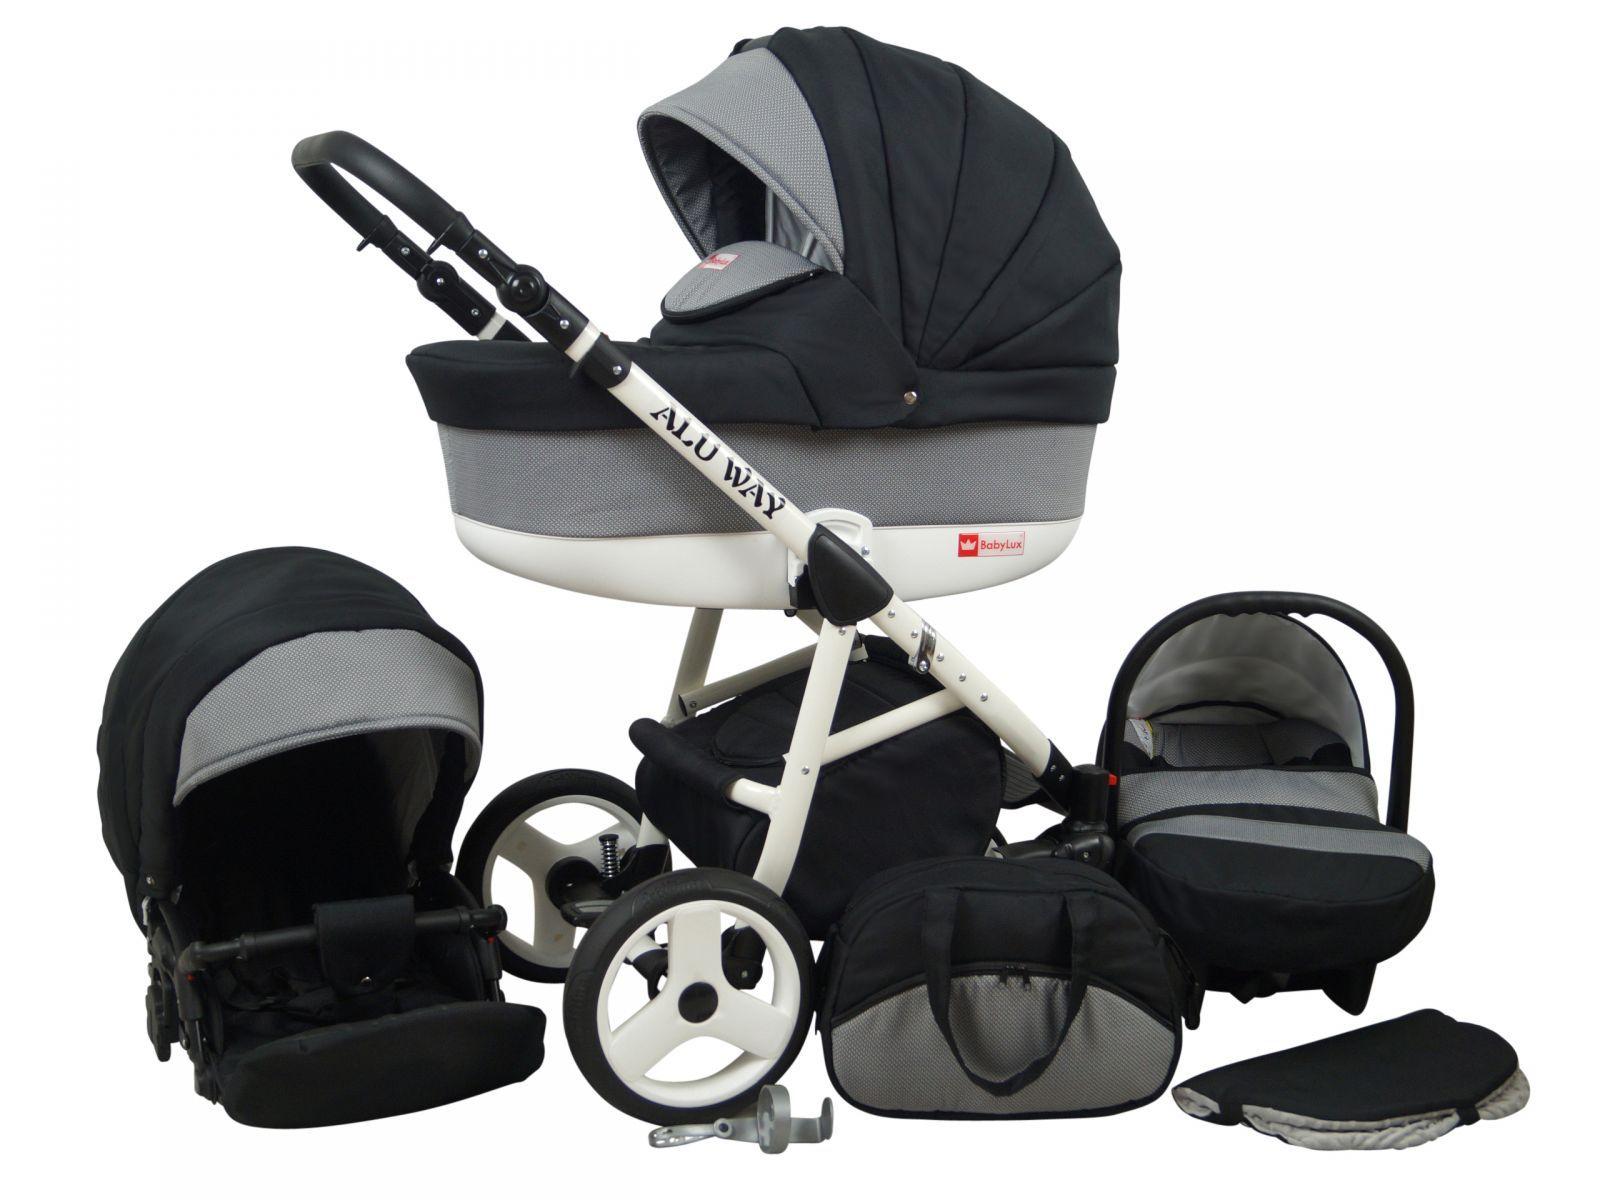 Raf-pol Baby Lux Alu way 2v1 2020 Carbon + u nás ZÁRUKA 3 ROKY